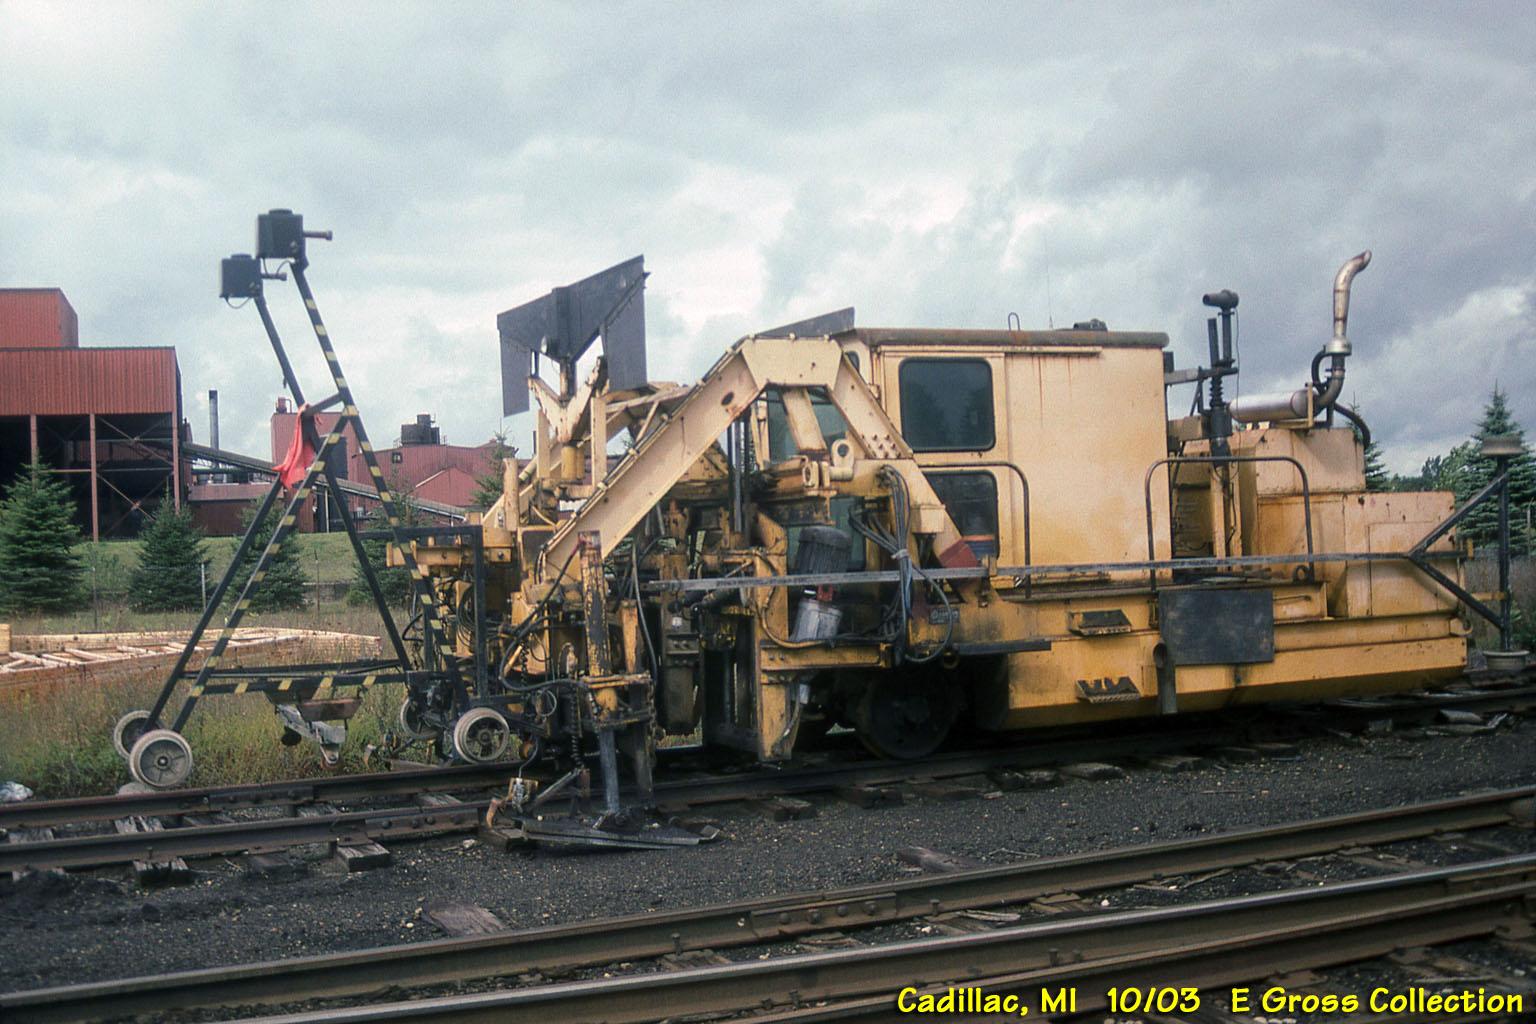 Miscellaneous Railroad Equipment